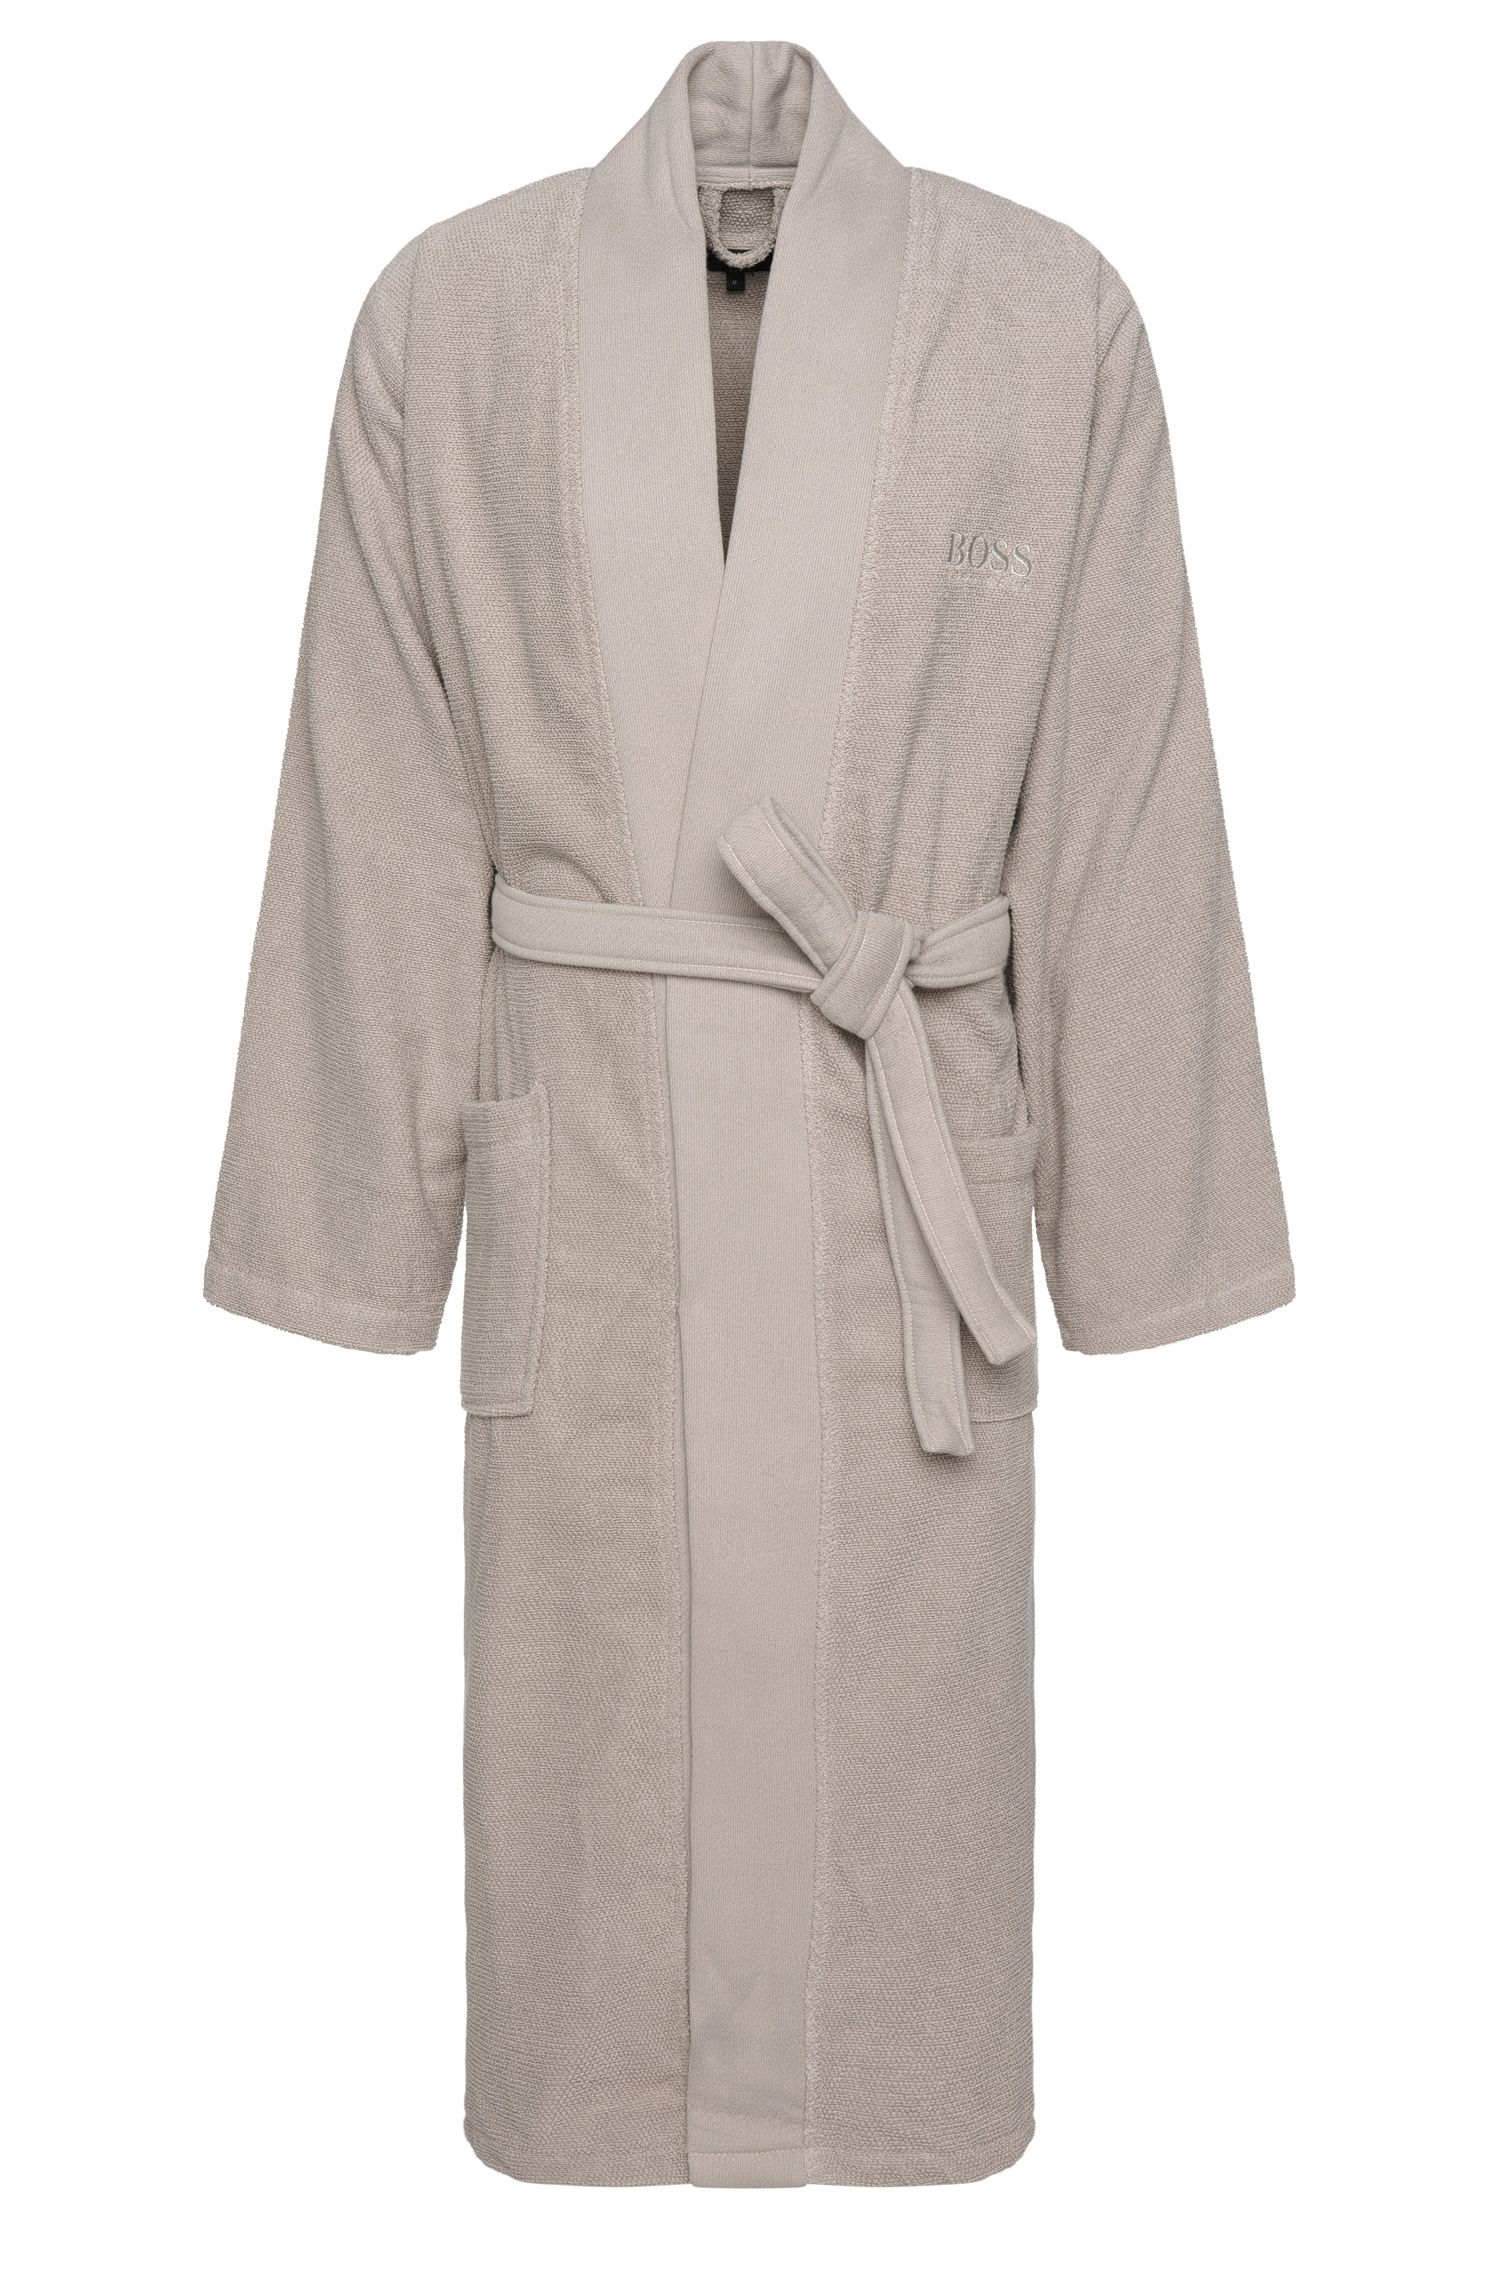 Peignoir style kimono en coton peigné de la mer Égée